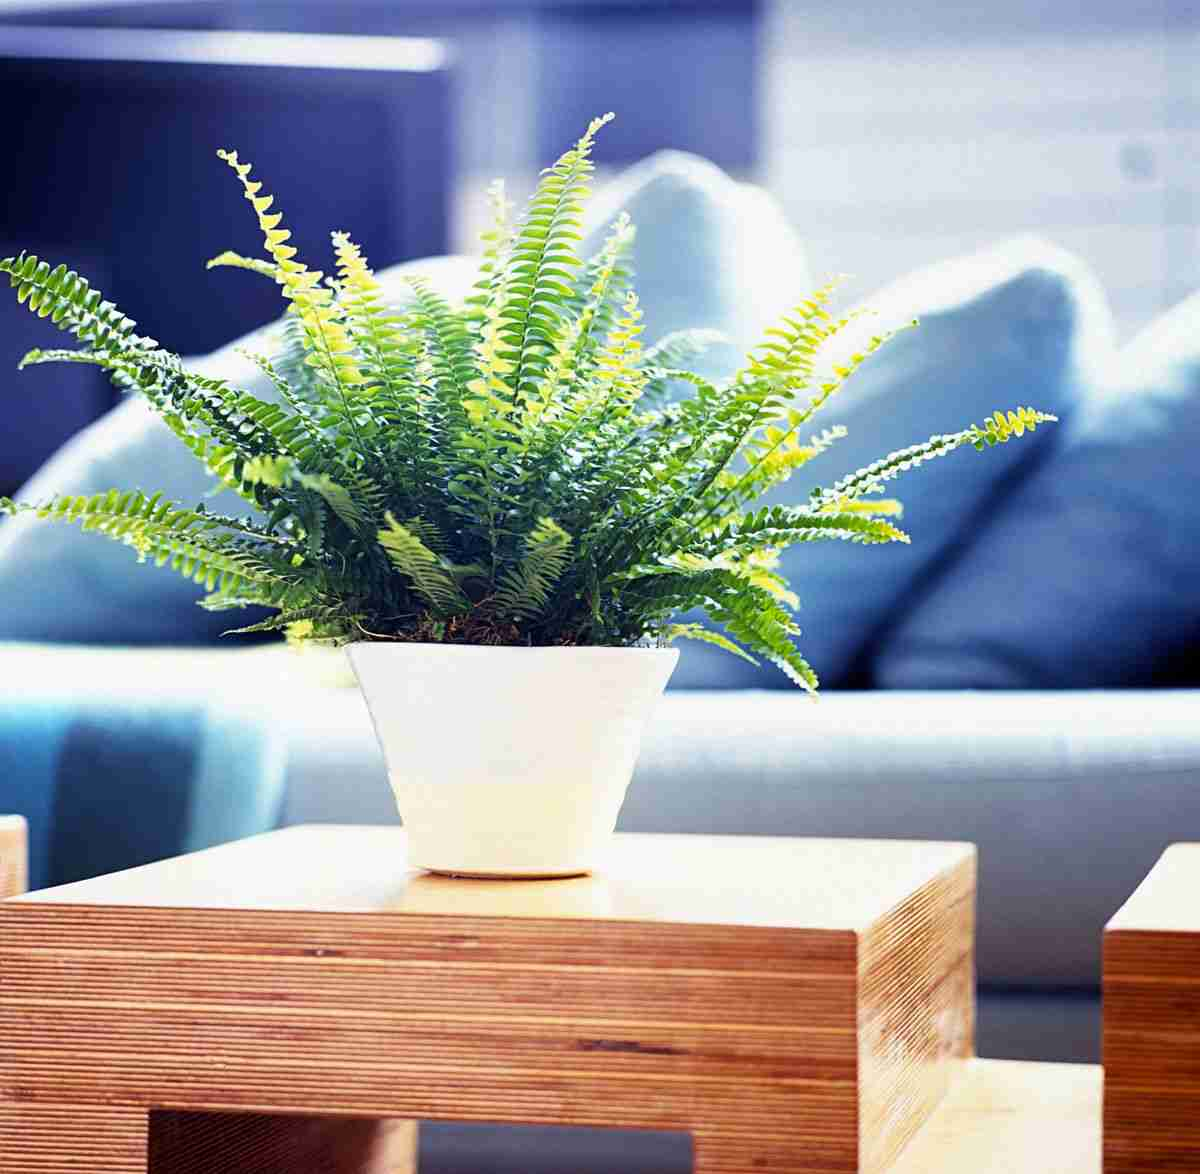 6 Plantas de invierno para decorar tu hogar 15